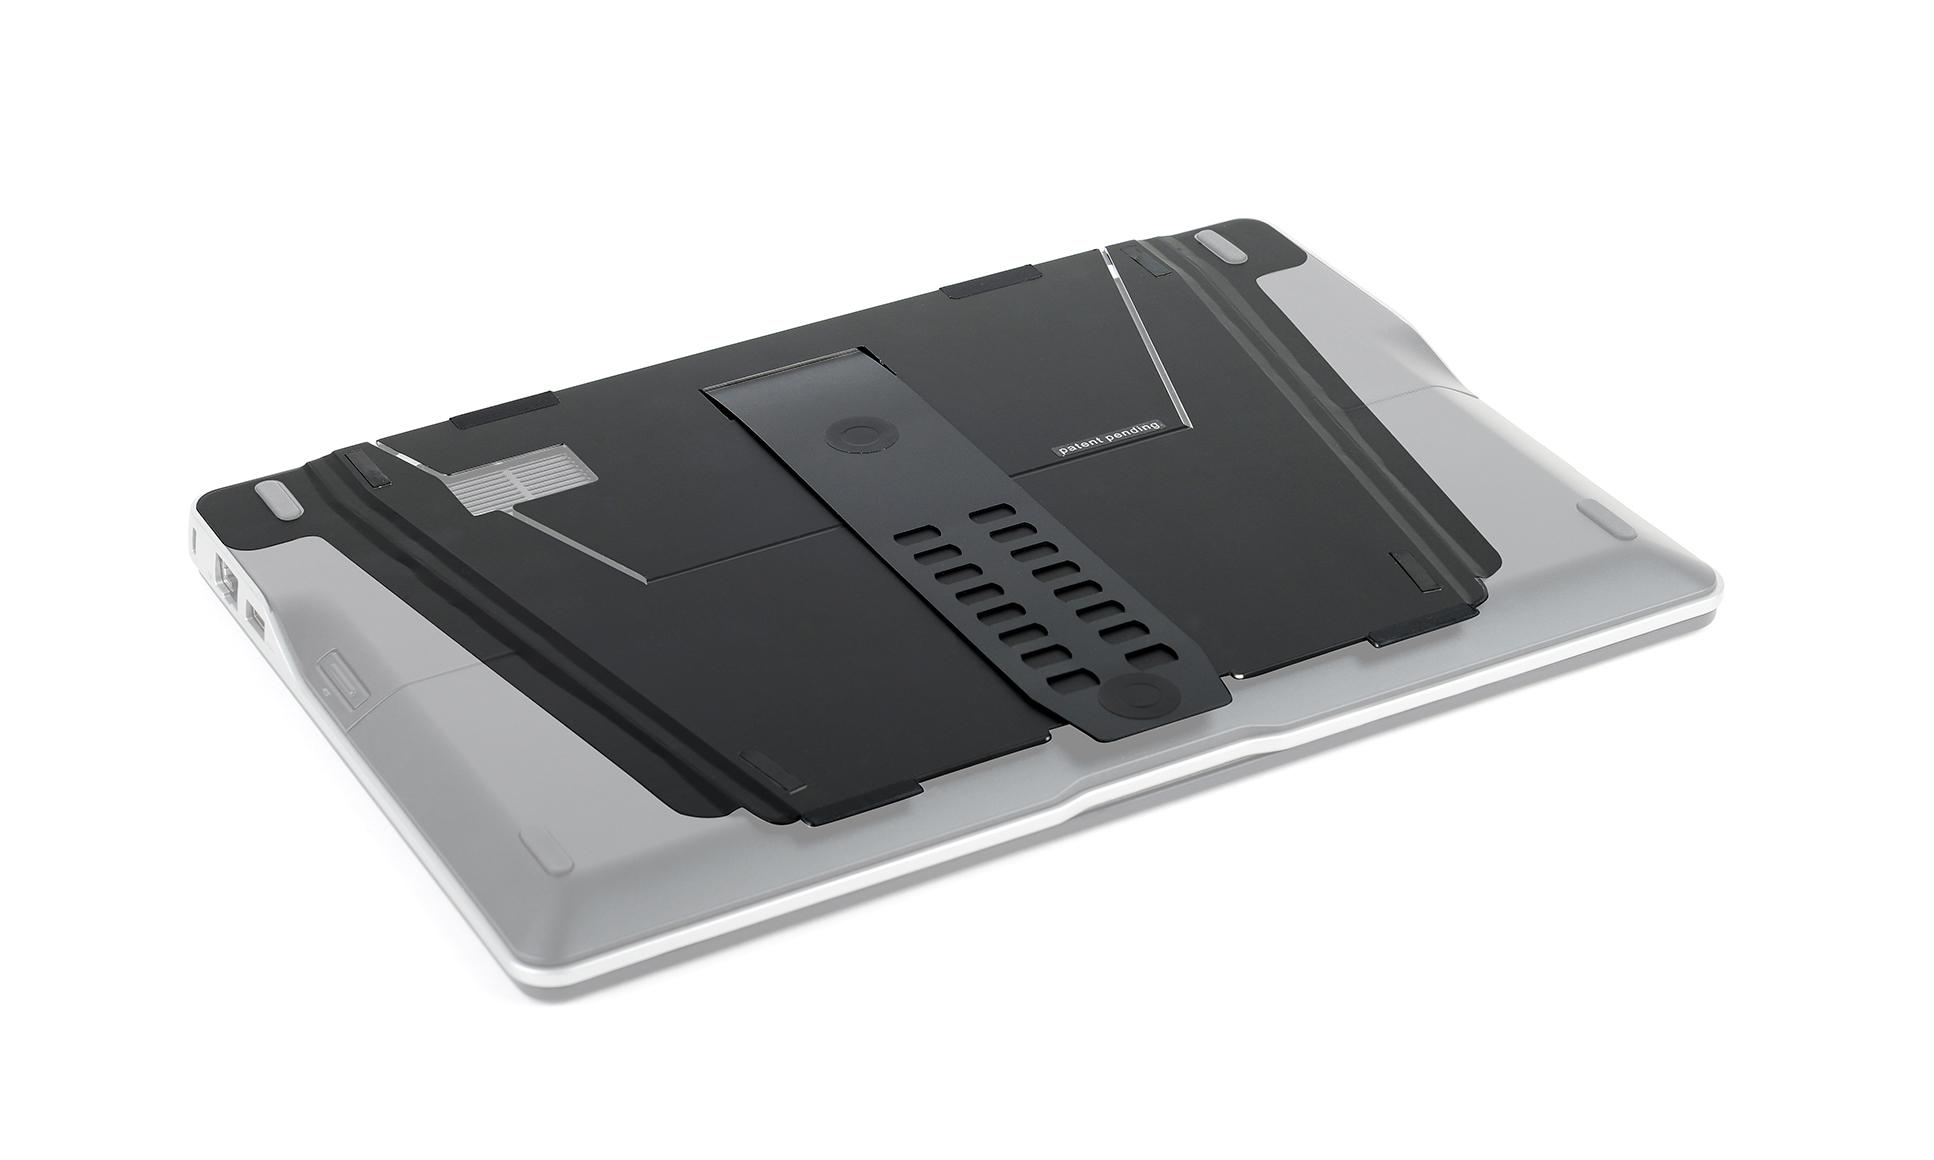 Notebook-Ständer UltraStand (Bakker Elkhuizen)